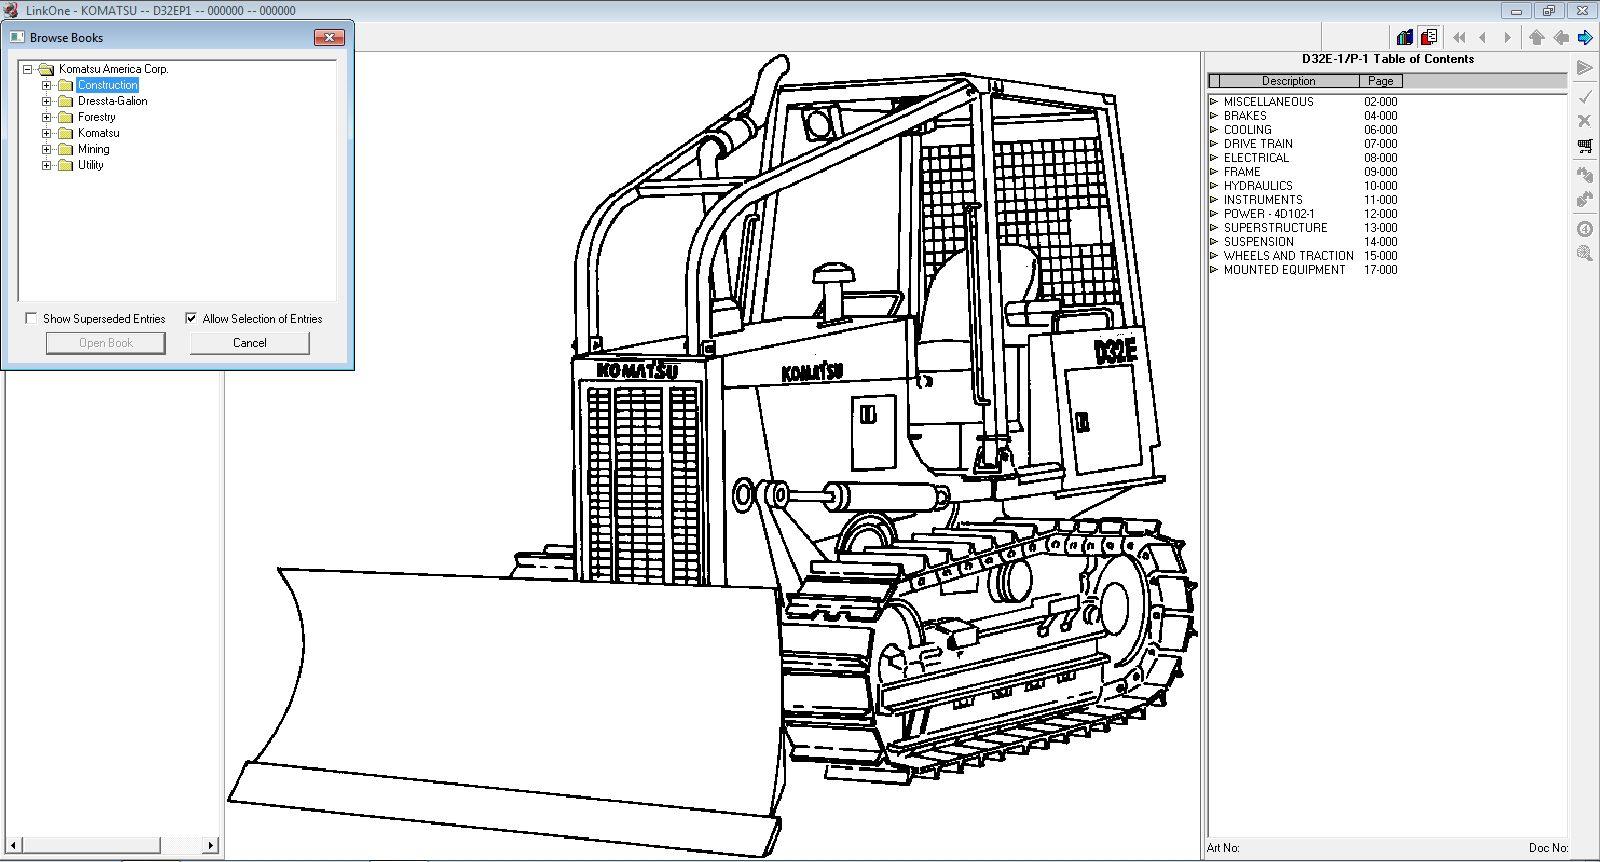 Komatsu_LinkOne_Parts_Catalogue_EPC_USA_112018_Offline_2